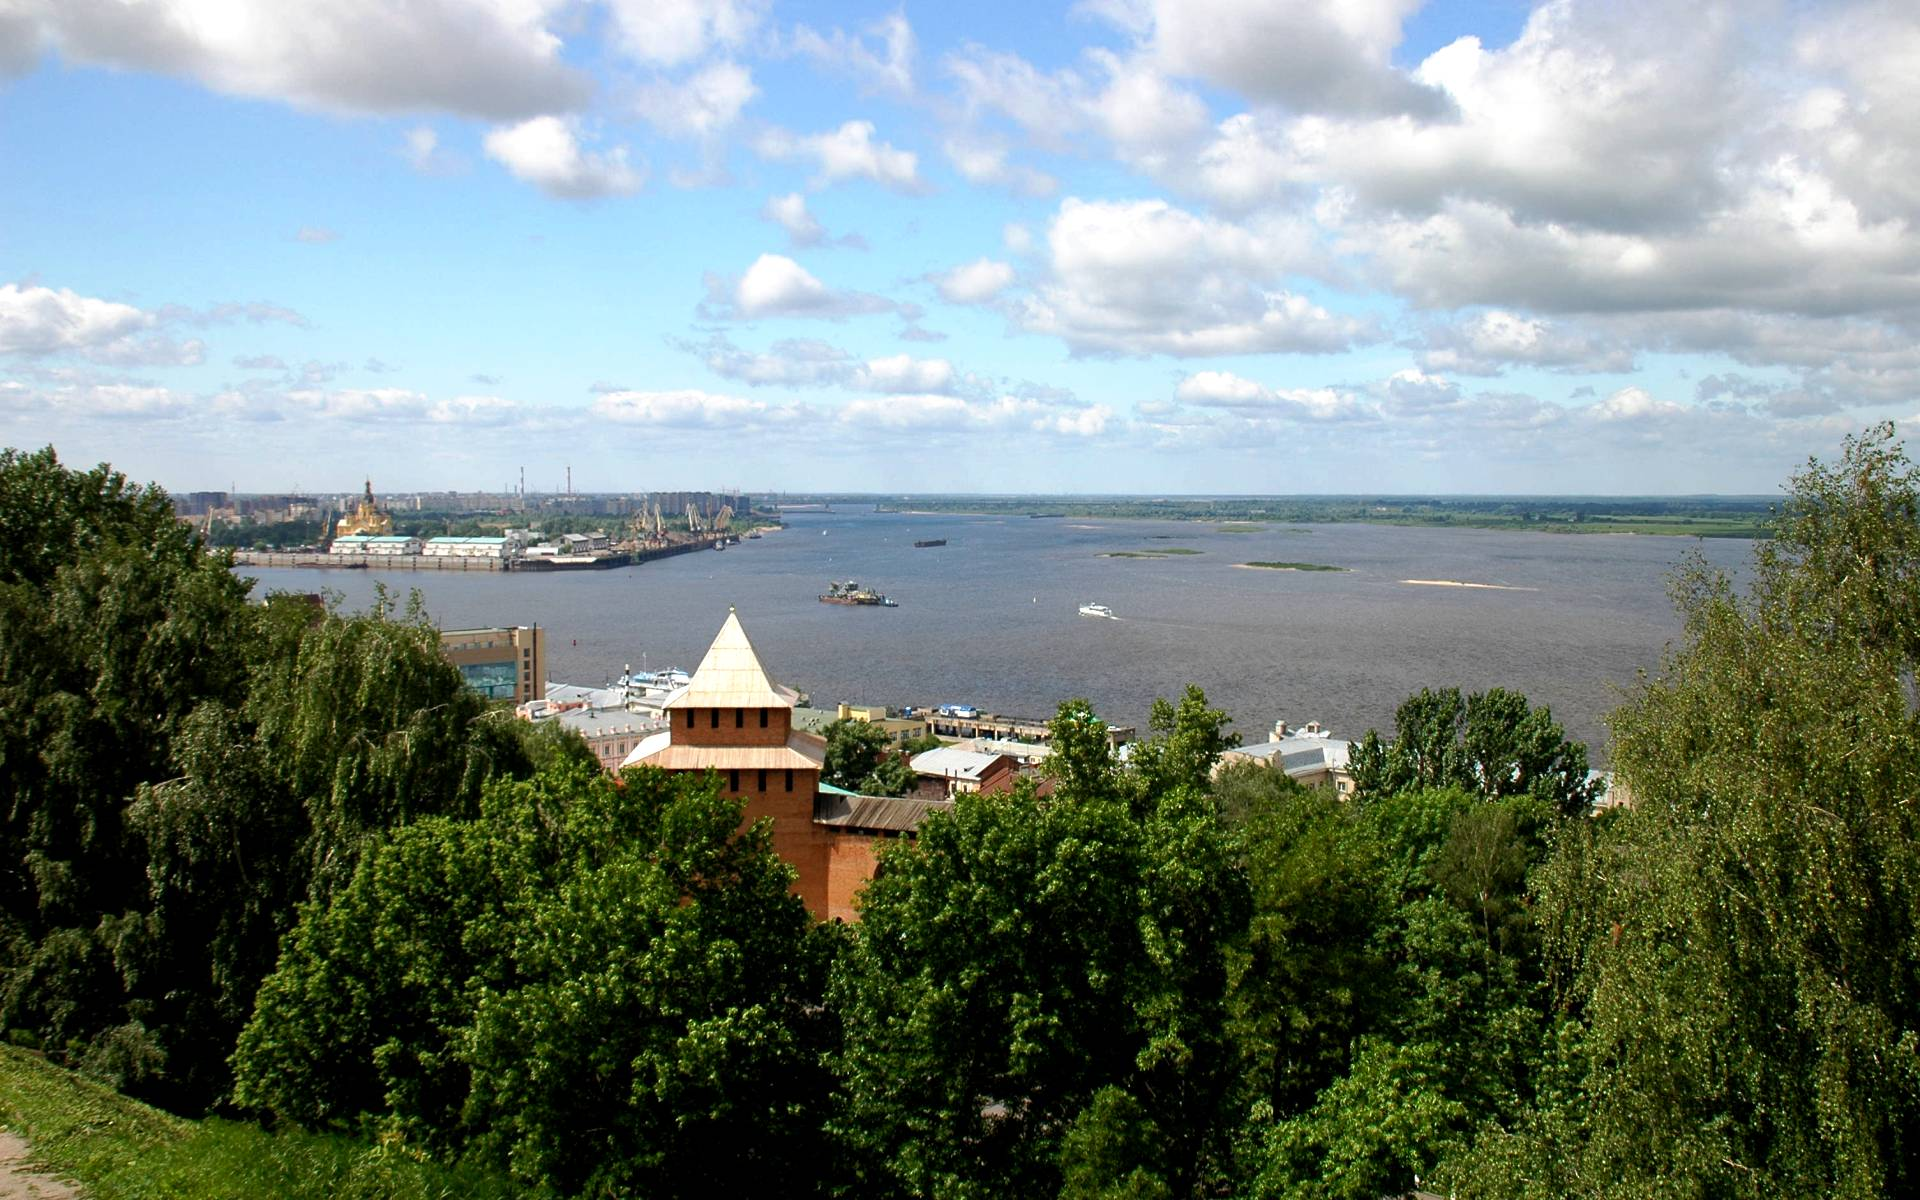 Картинка Нижний Новгород. Слияние ...: www.kartinki24.ru/kartinki/nizhniy-novgorod/12376.html